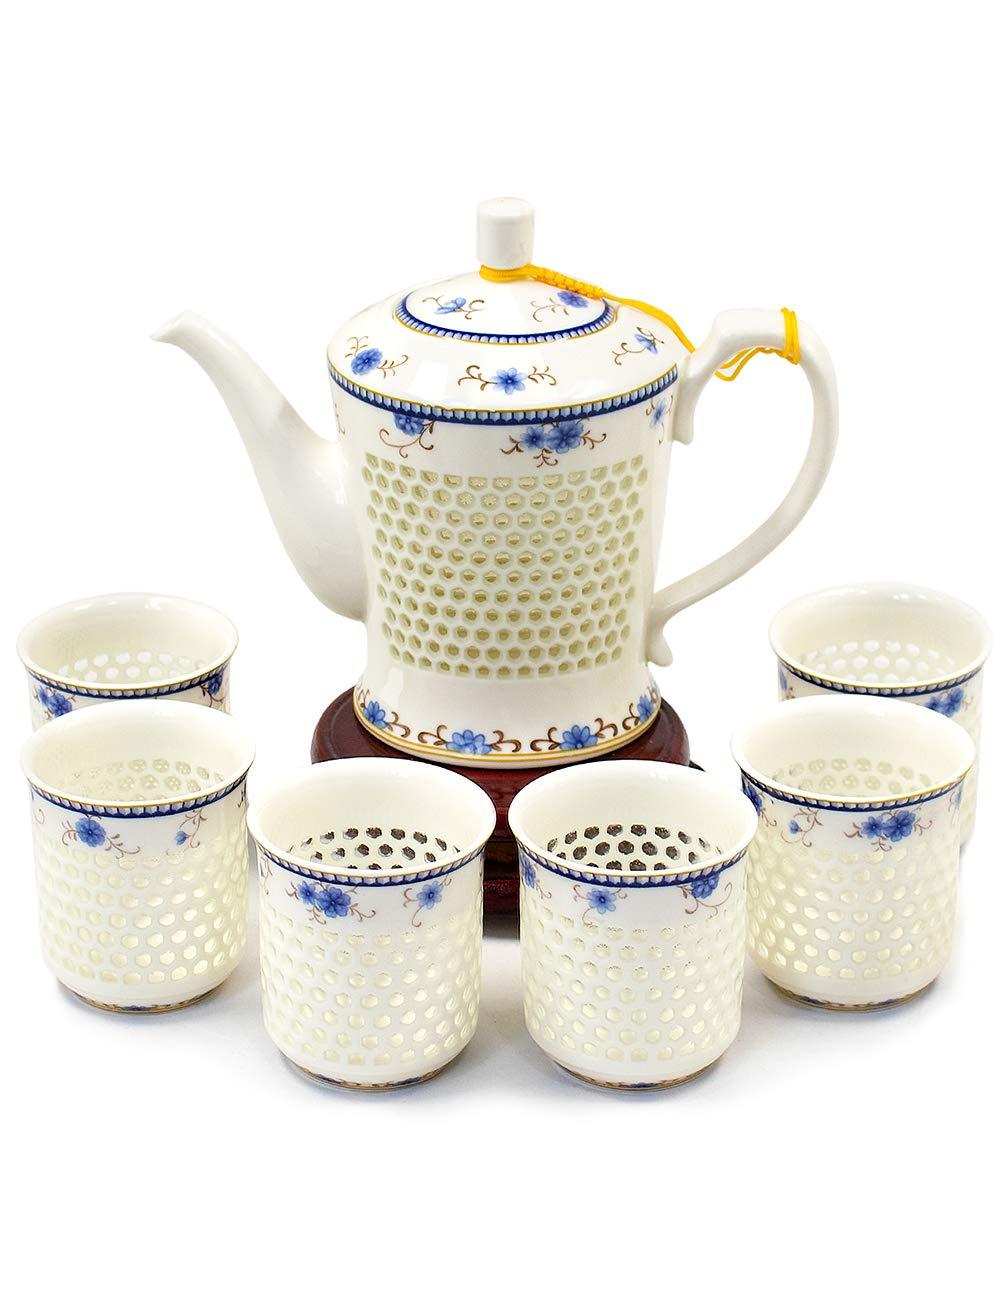 Dahlia Rice Grain Porcelain Tea Set (Teapot + 6 Teacups) in Gift Box, Ling Long Devil's Work Floral